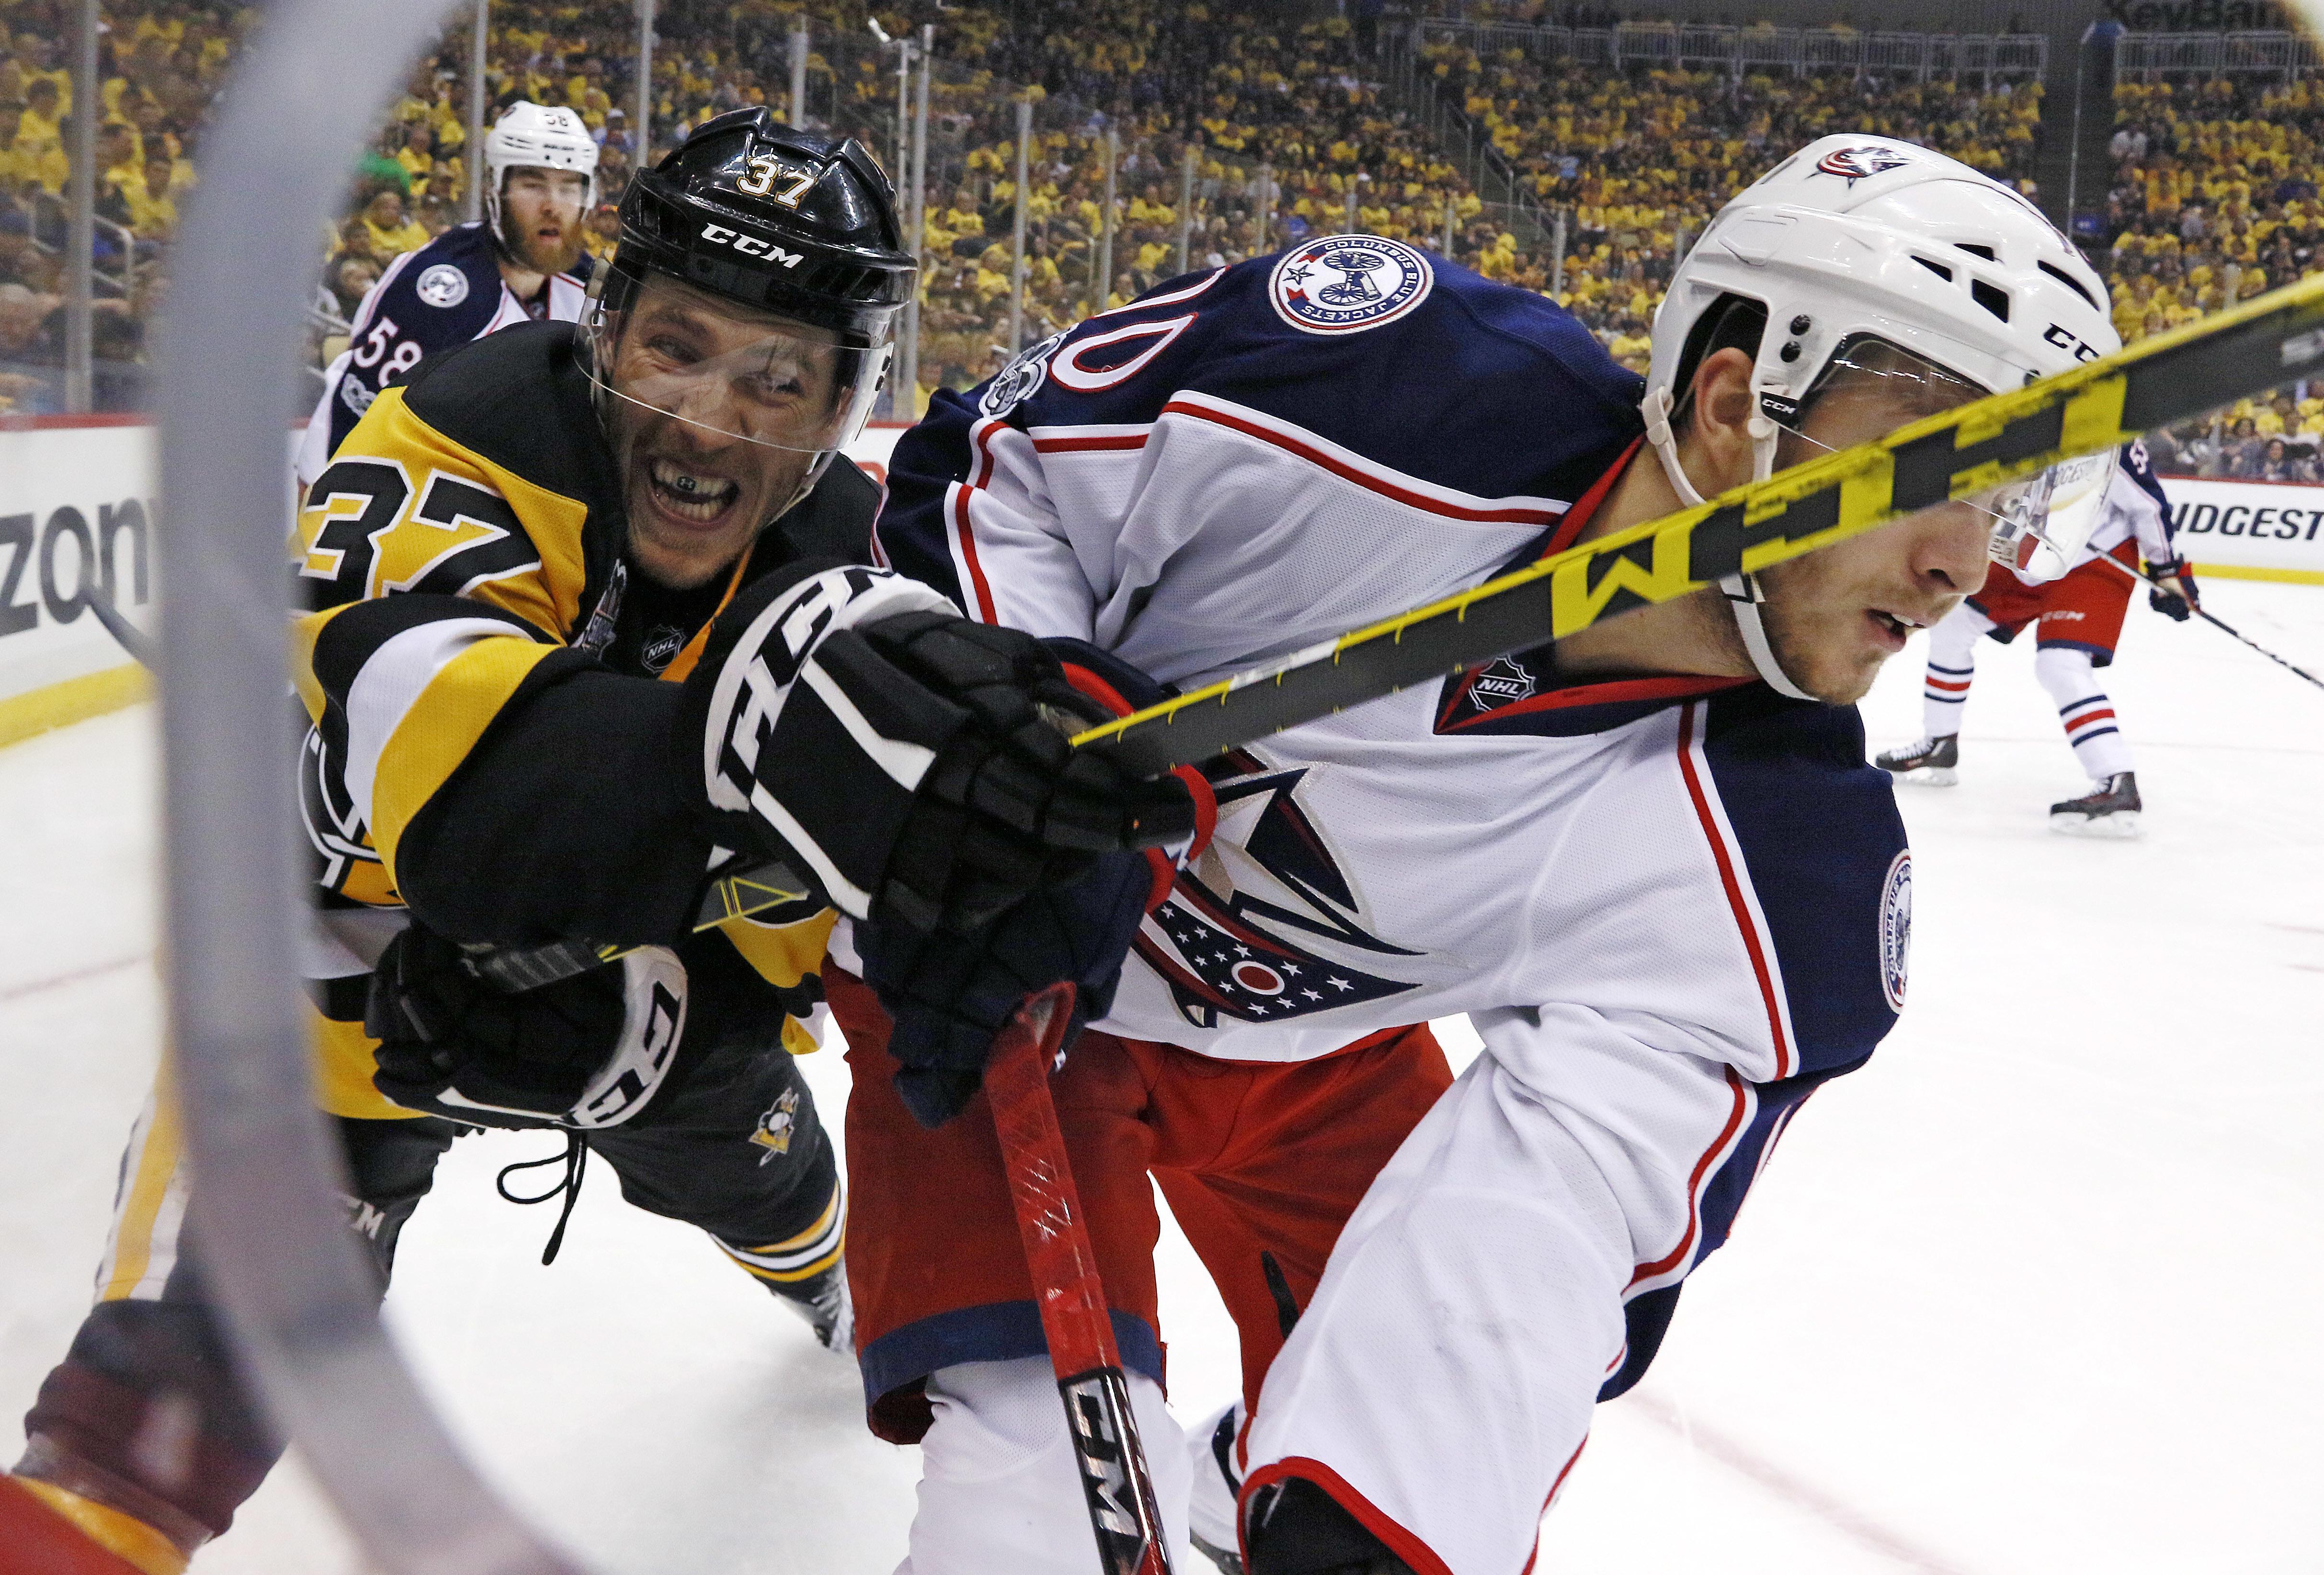 Blue_jackets_penguins_hockey_43649